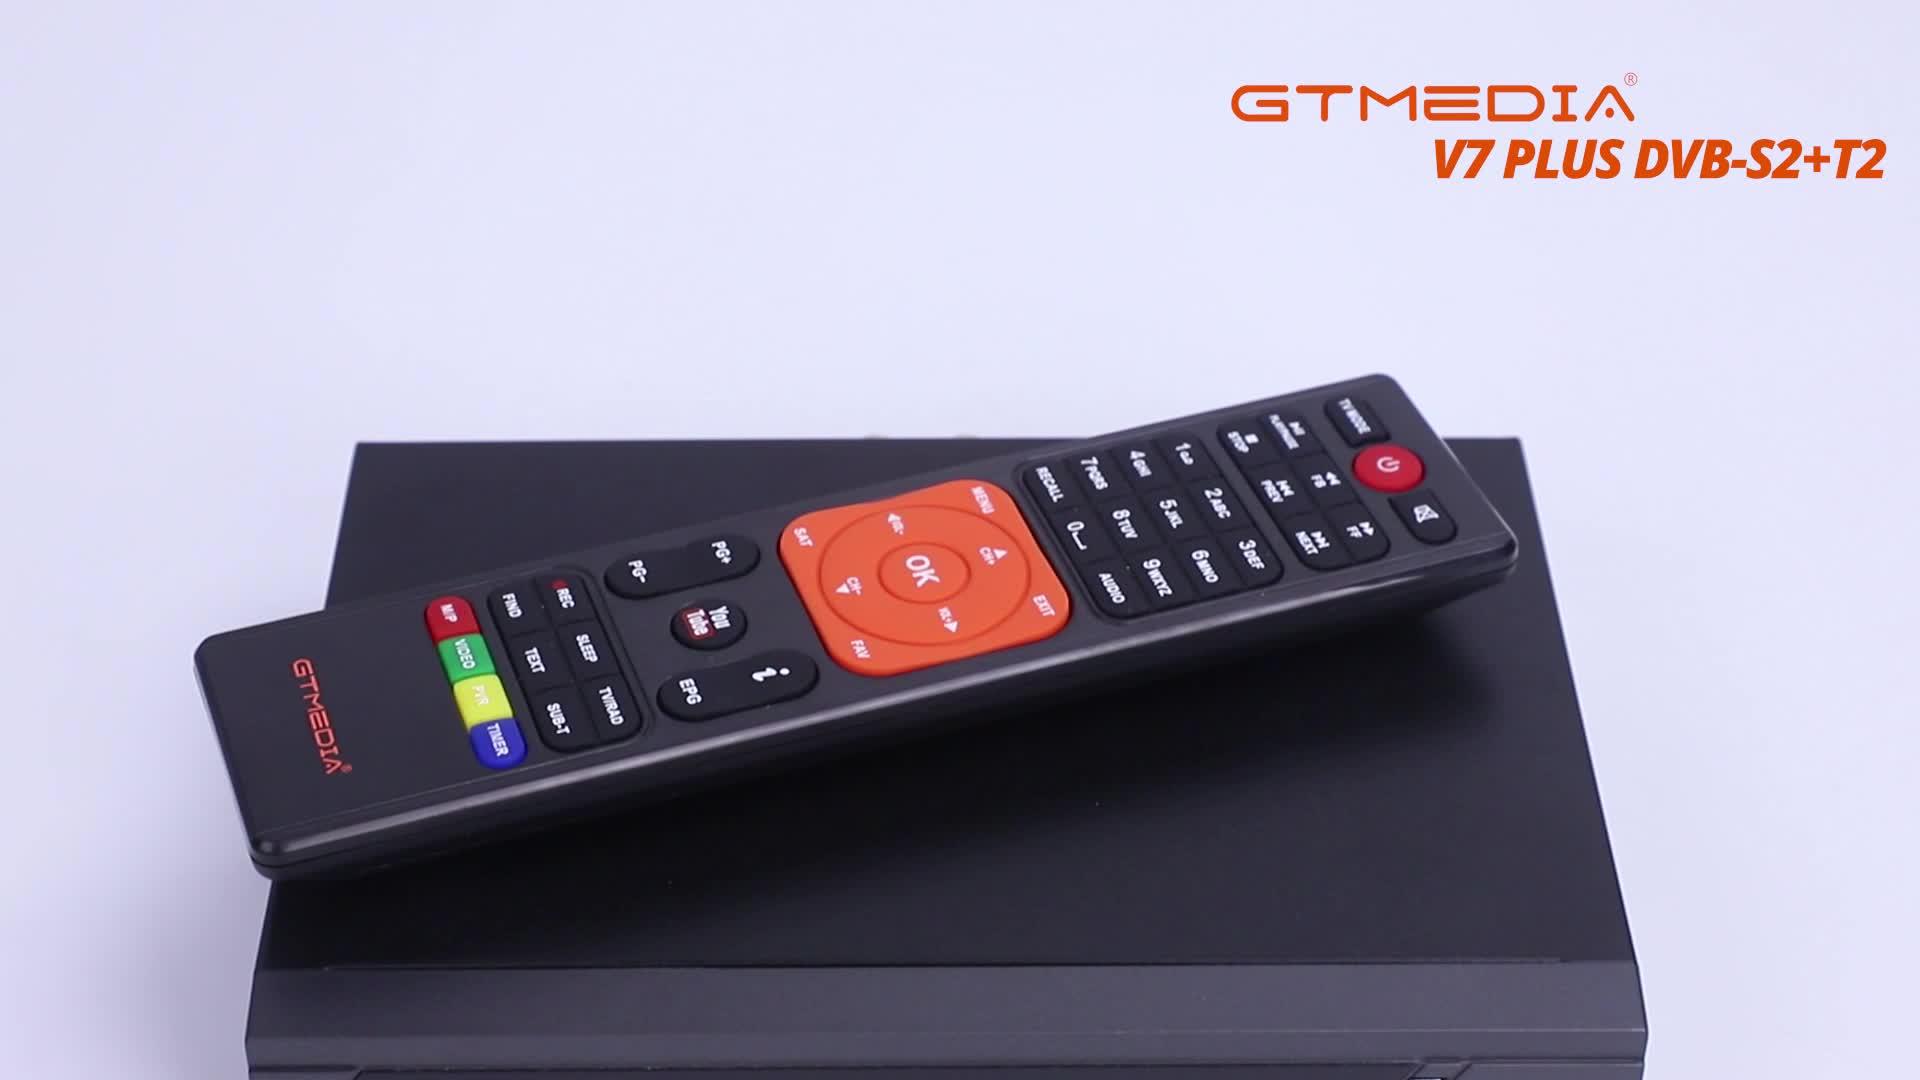 FREE SAT HD Satellite Adult TV Channels TV Decoder DVB-S2 FTA Africa Satellite T2 Combo Set-Top Box Digital Receptor PVR 1080P